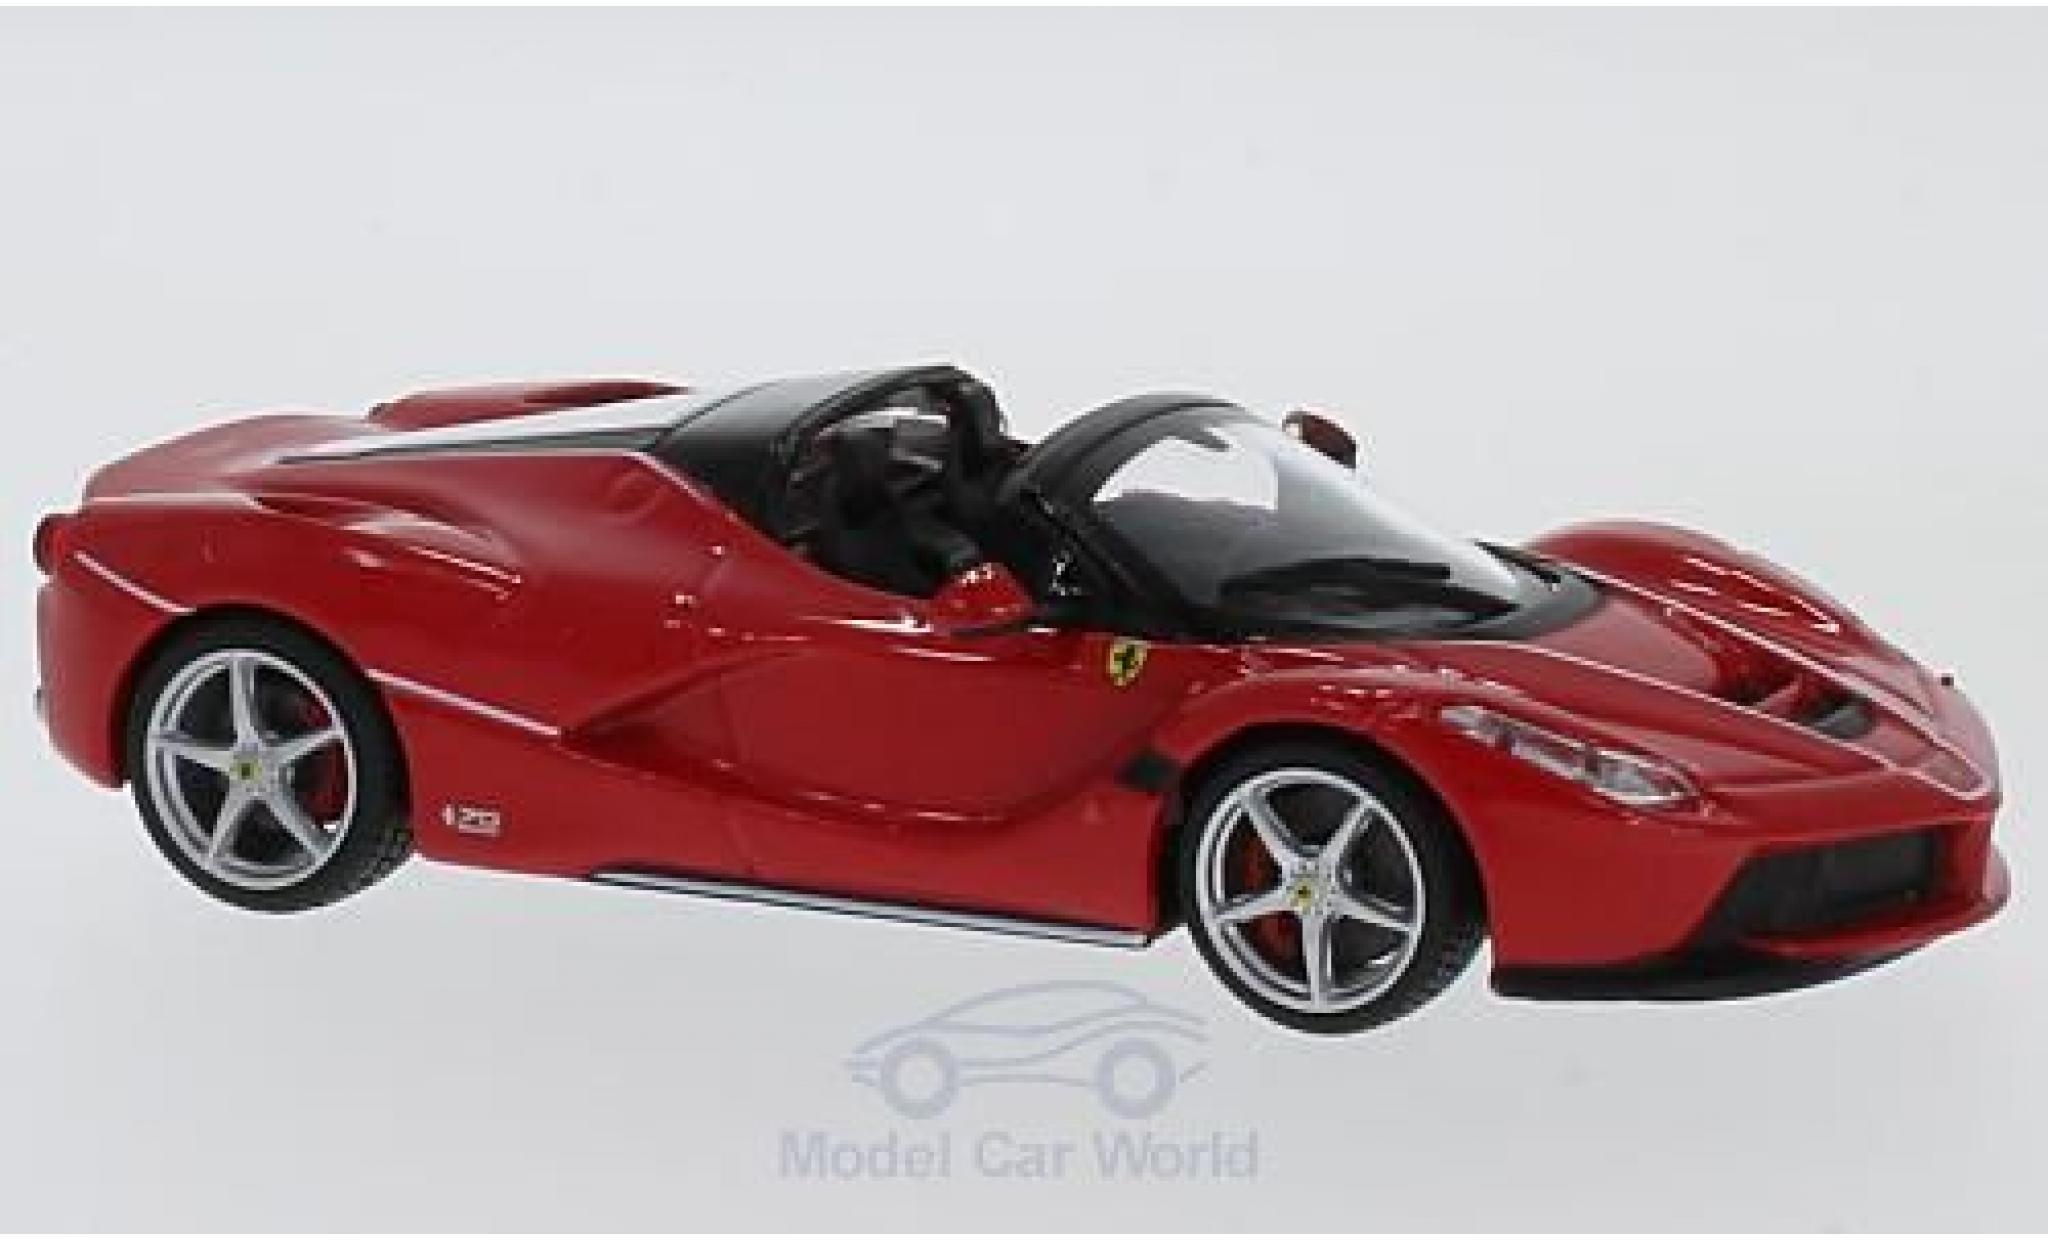 Ferrari LaFerrari 1/43 Bburago Laferrari Aperta red